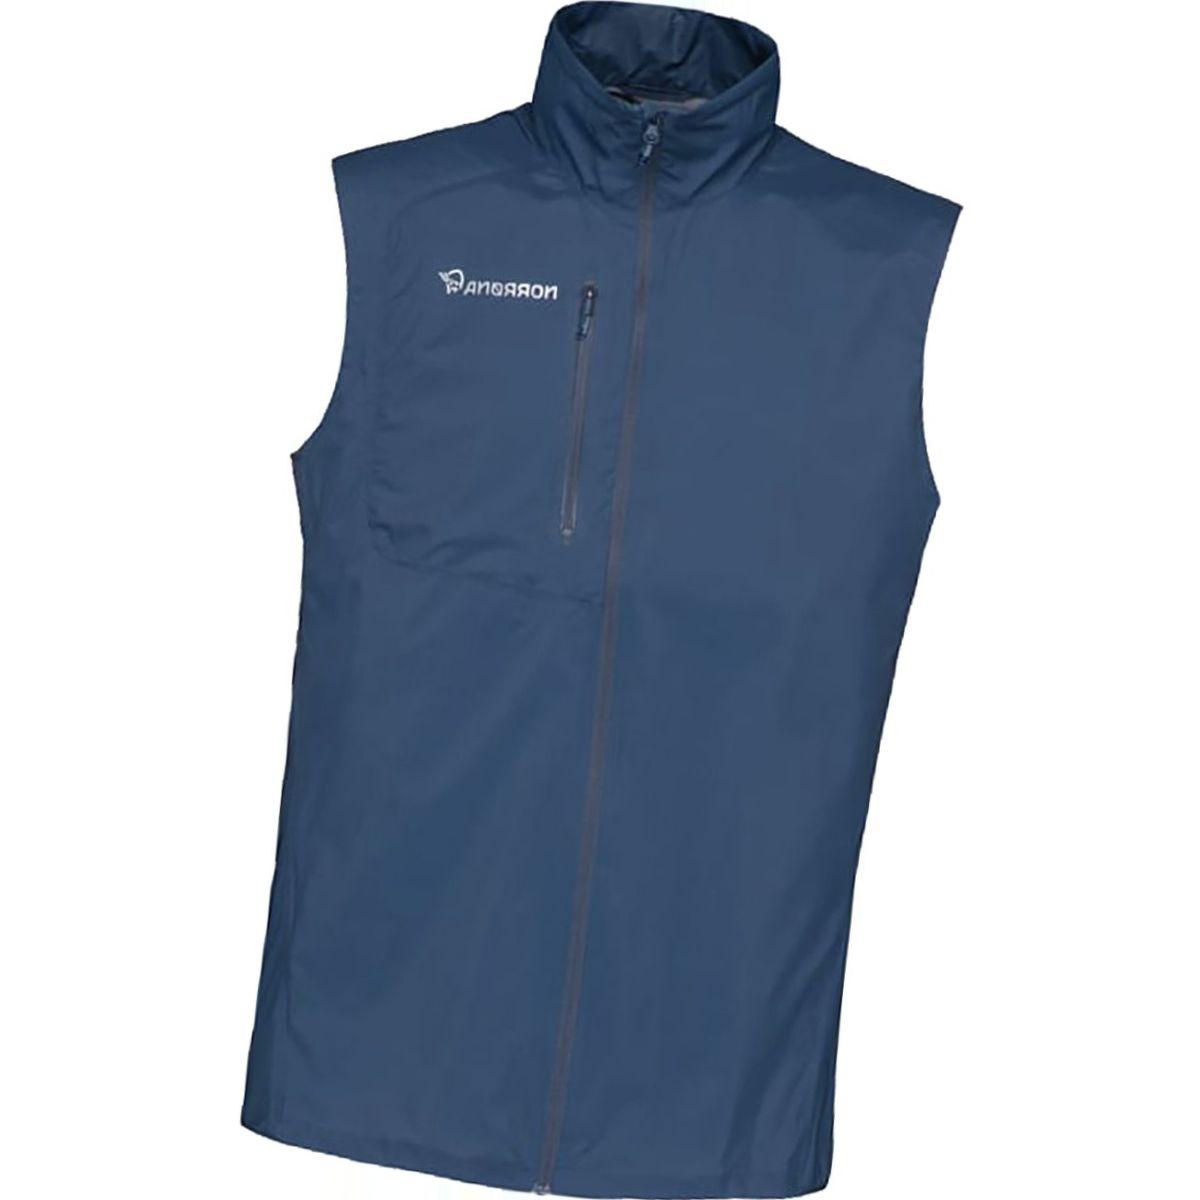 Norrona Bitihorn Aero100 Vest - Men's